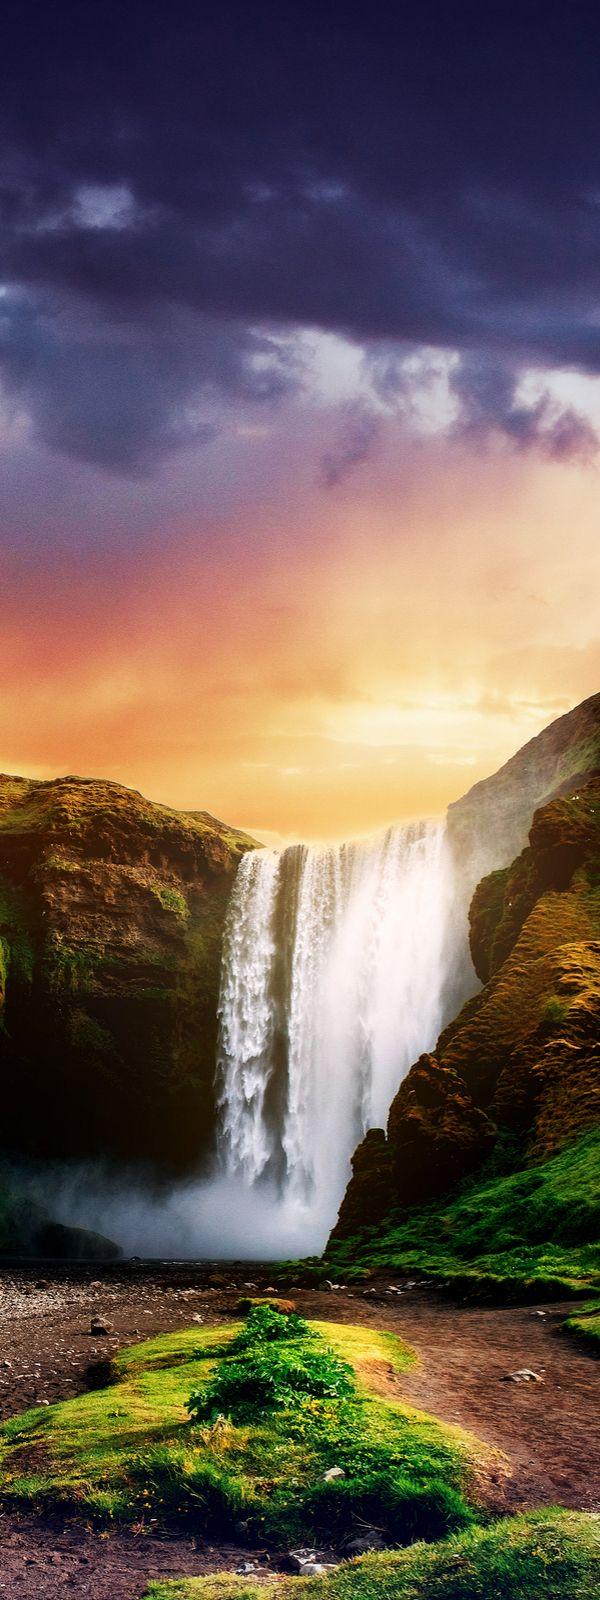 Skogafoss waterfall, Iceland                                                                                                                                                                                 More